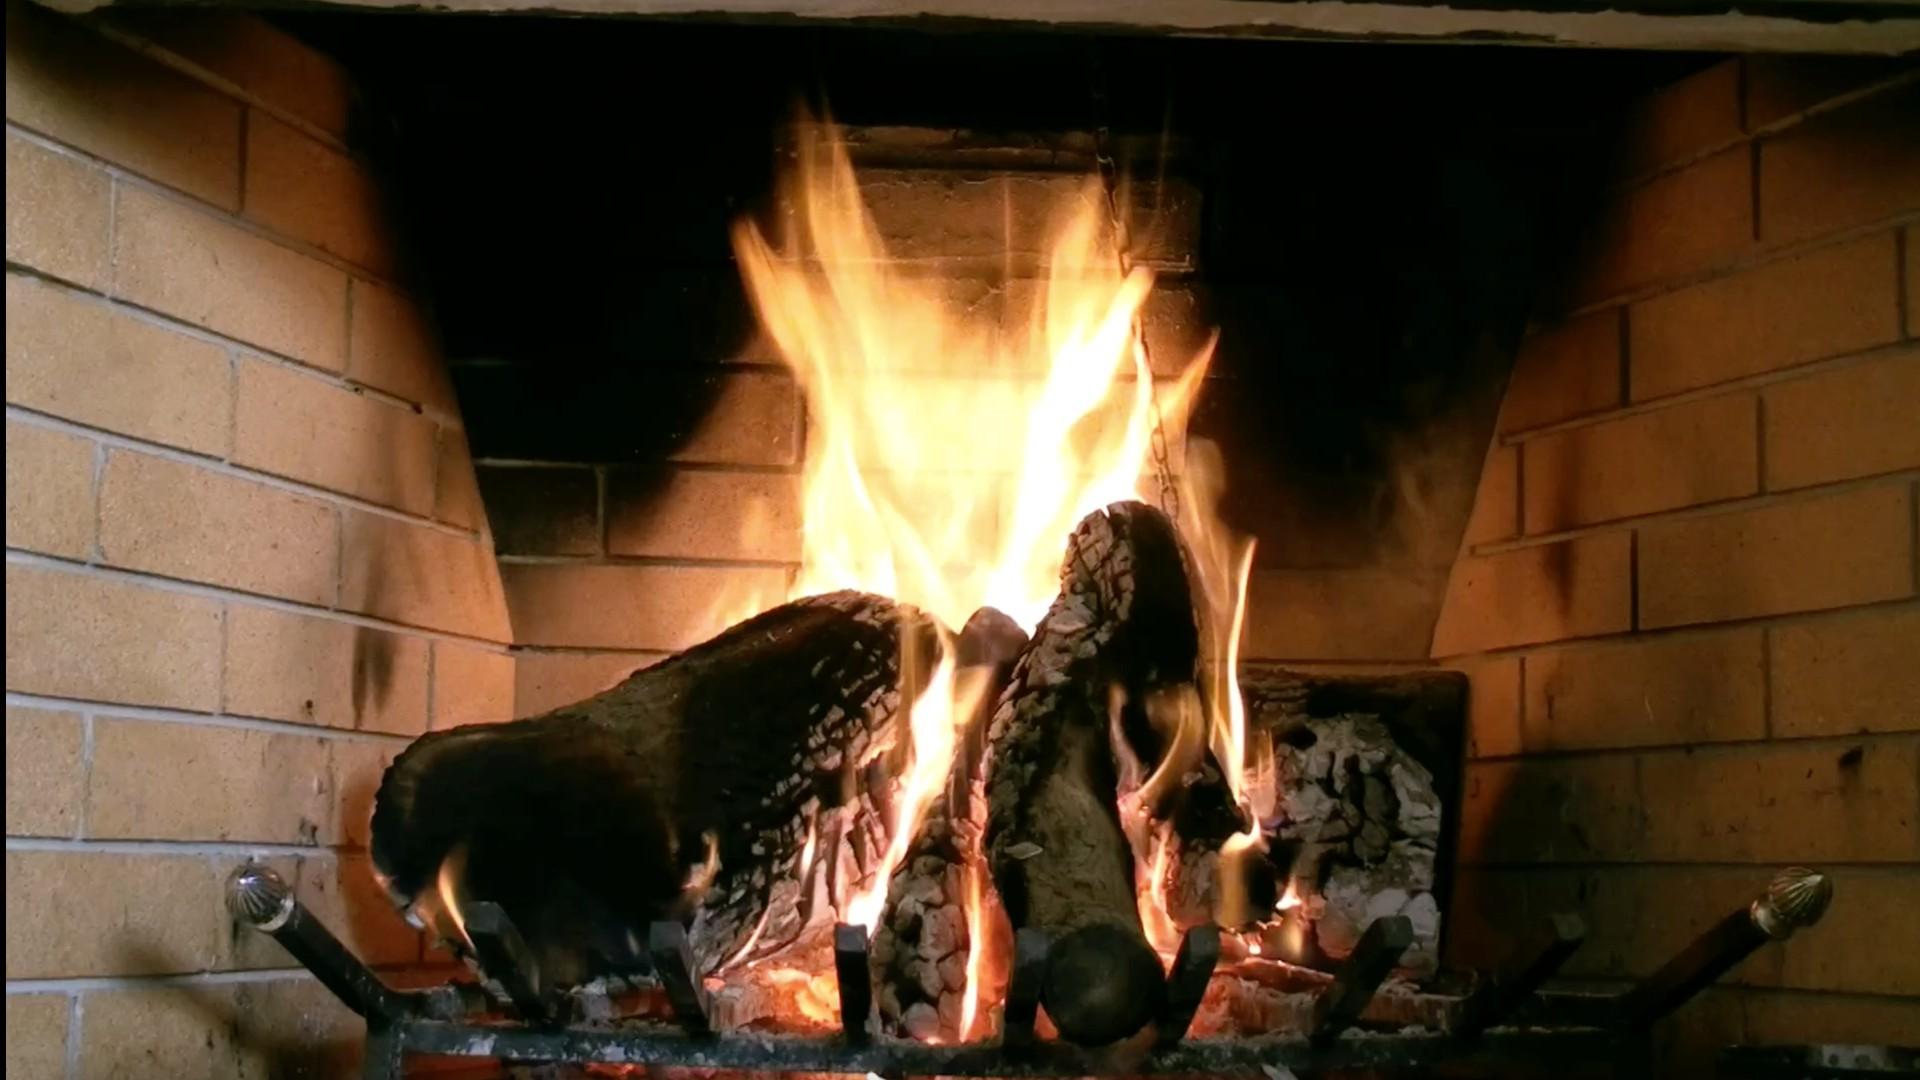 Fireplace Wallpaper 183 ① Download Free Stunning Hd